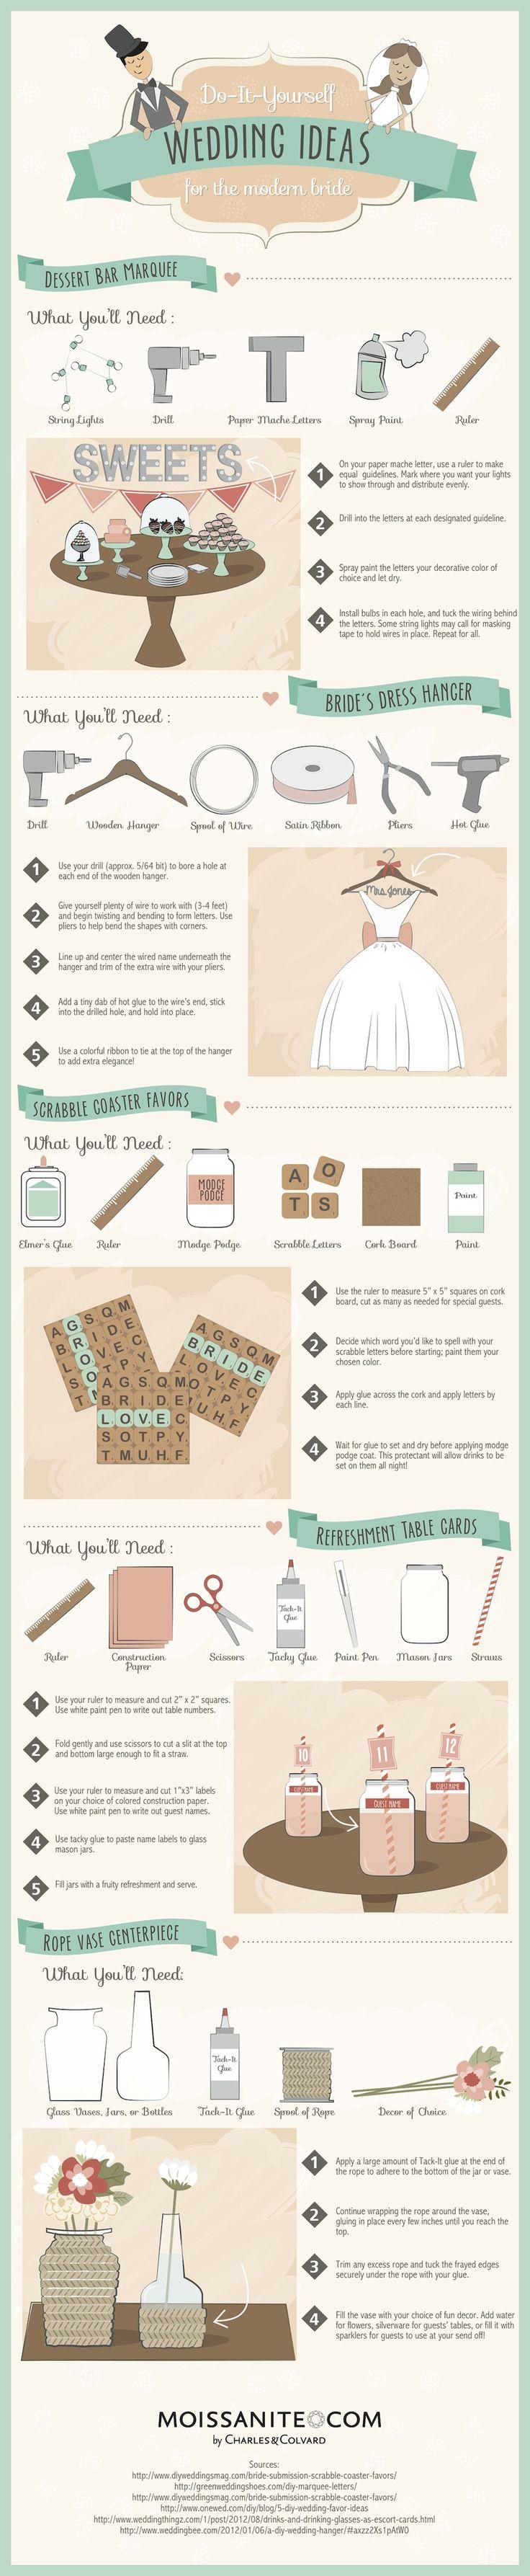 DIY Wedding Ideas for the Mode